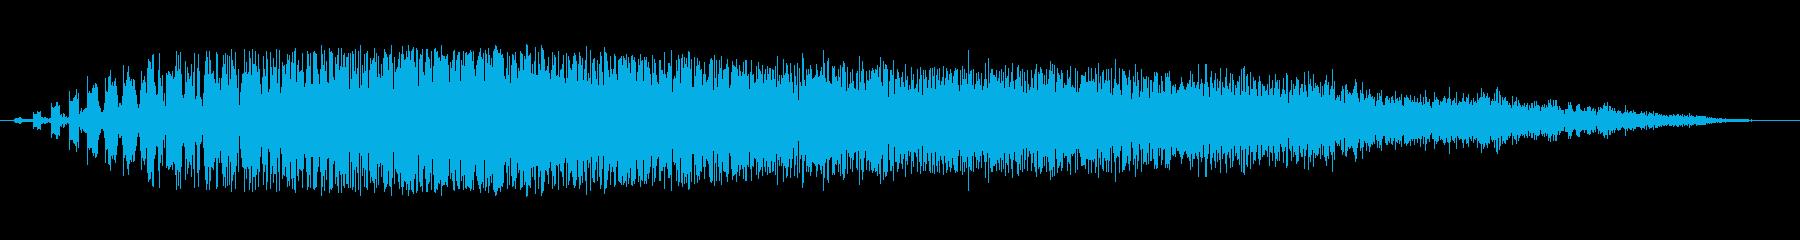 SPARK DISCHARGE、S...の再生済みの波形